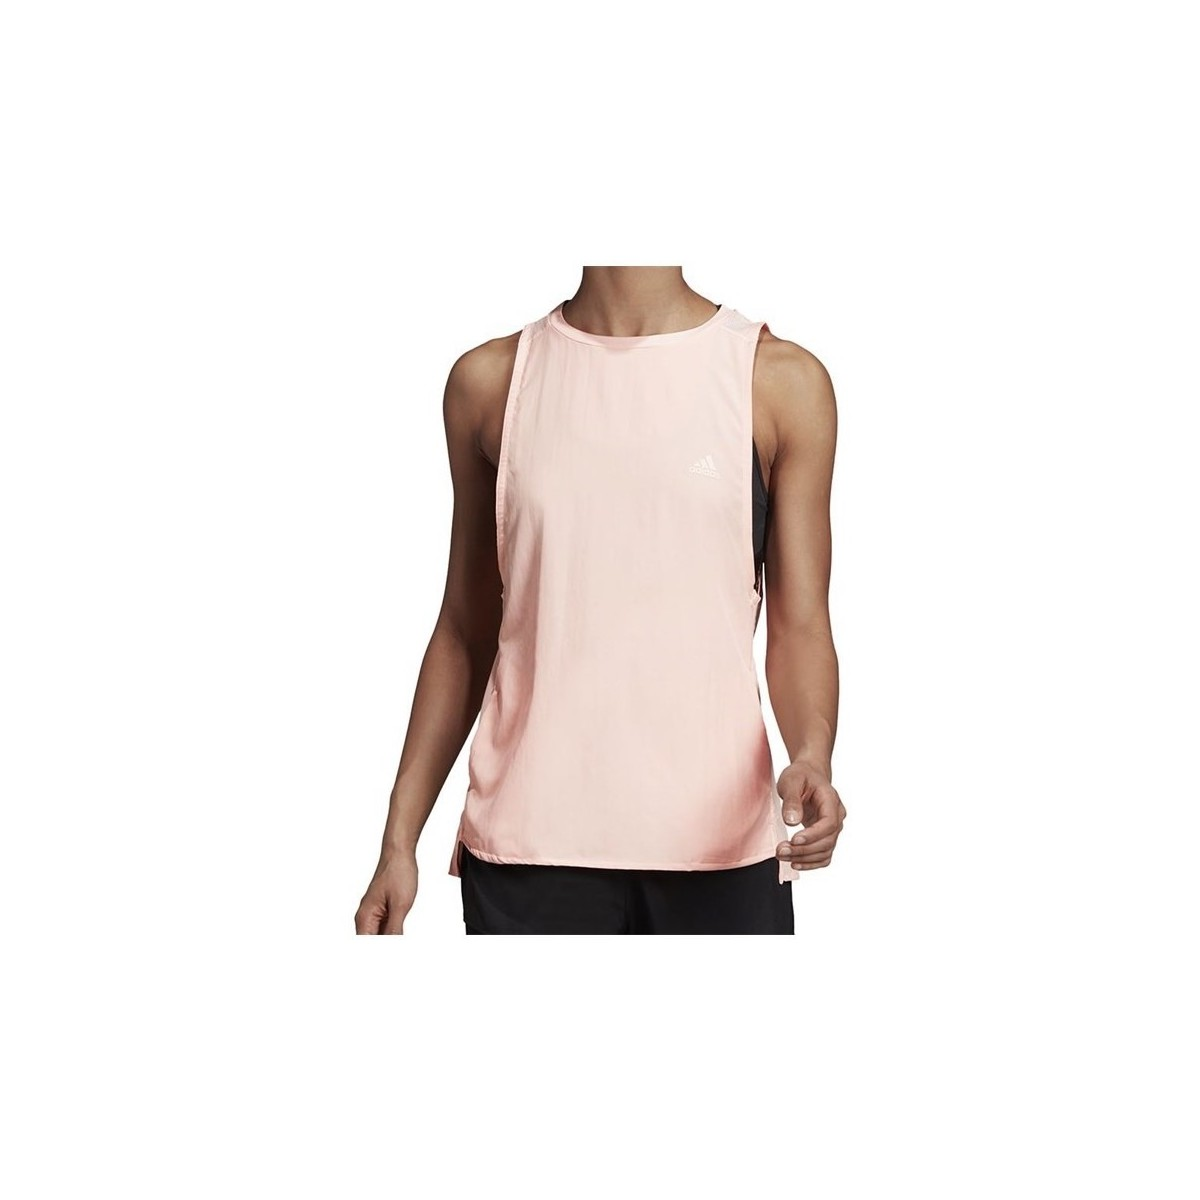 Toppe / T-shirts uden ærmer adidas  257 Tank W